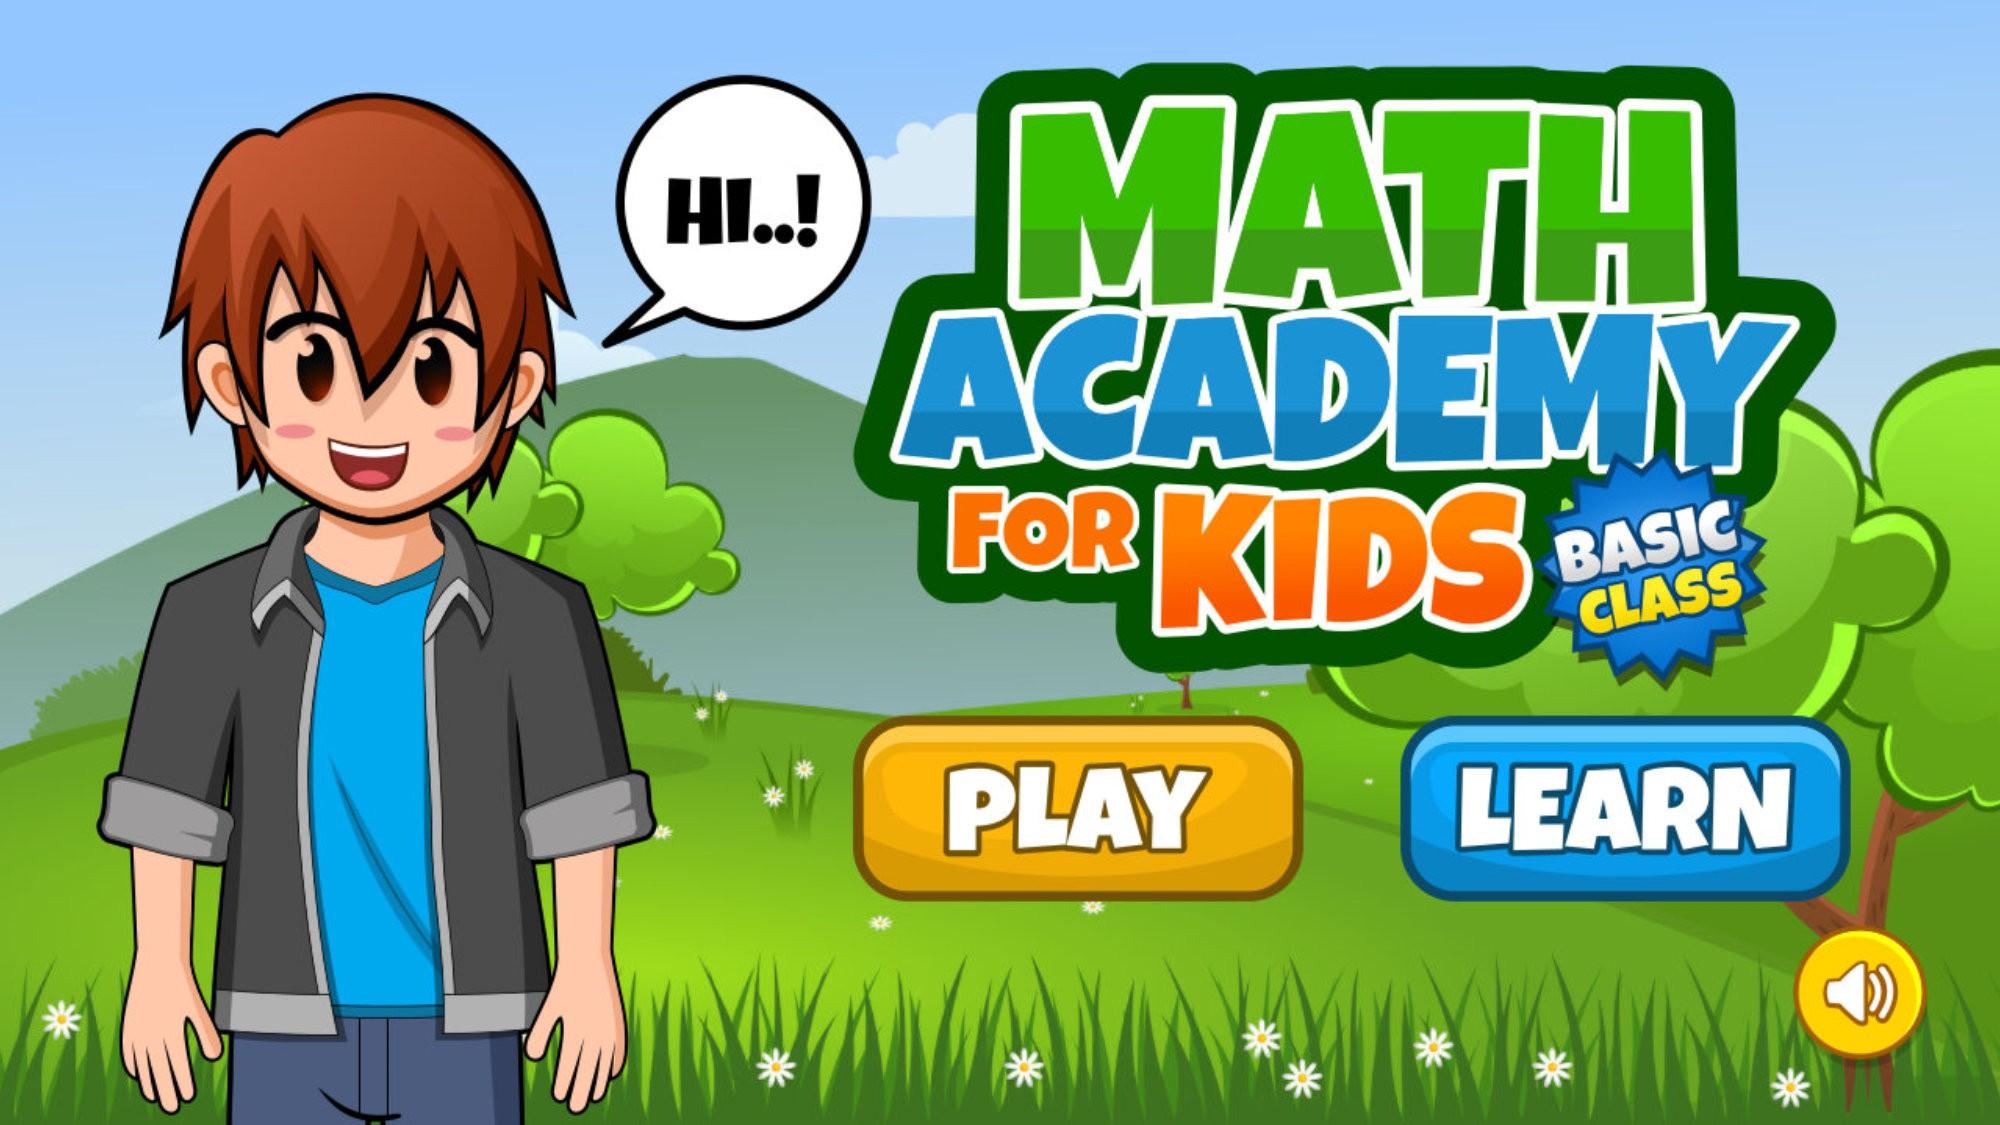 Math Academy for Kids Basic